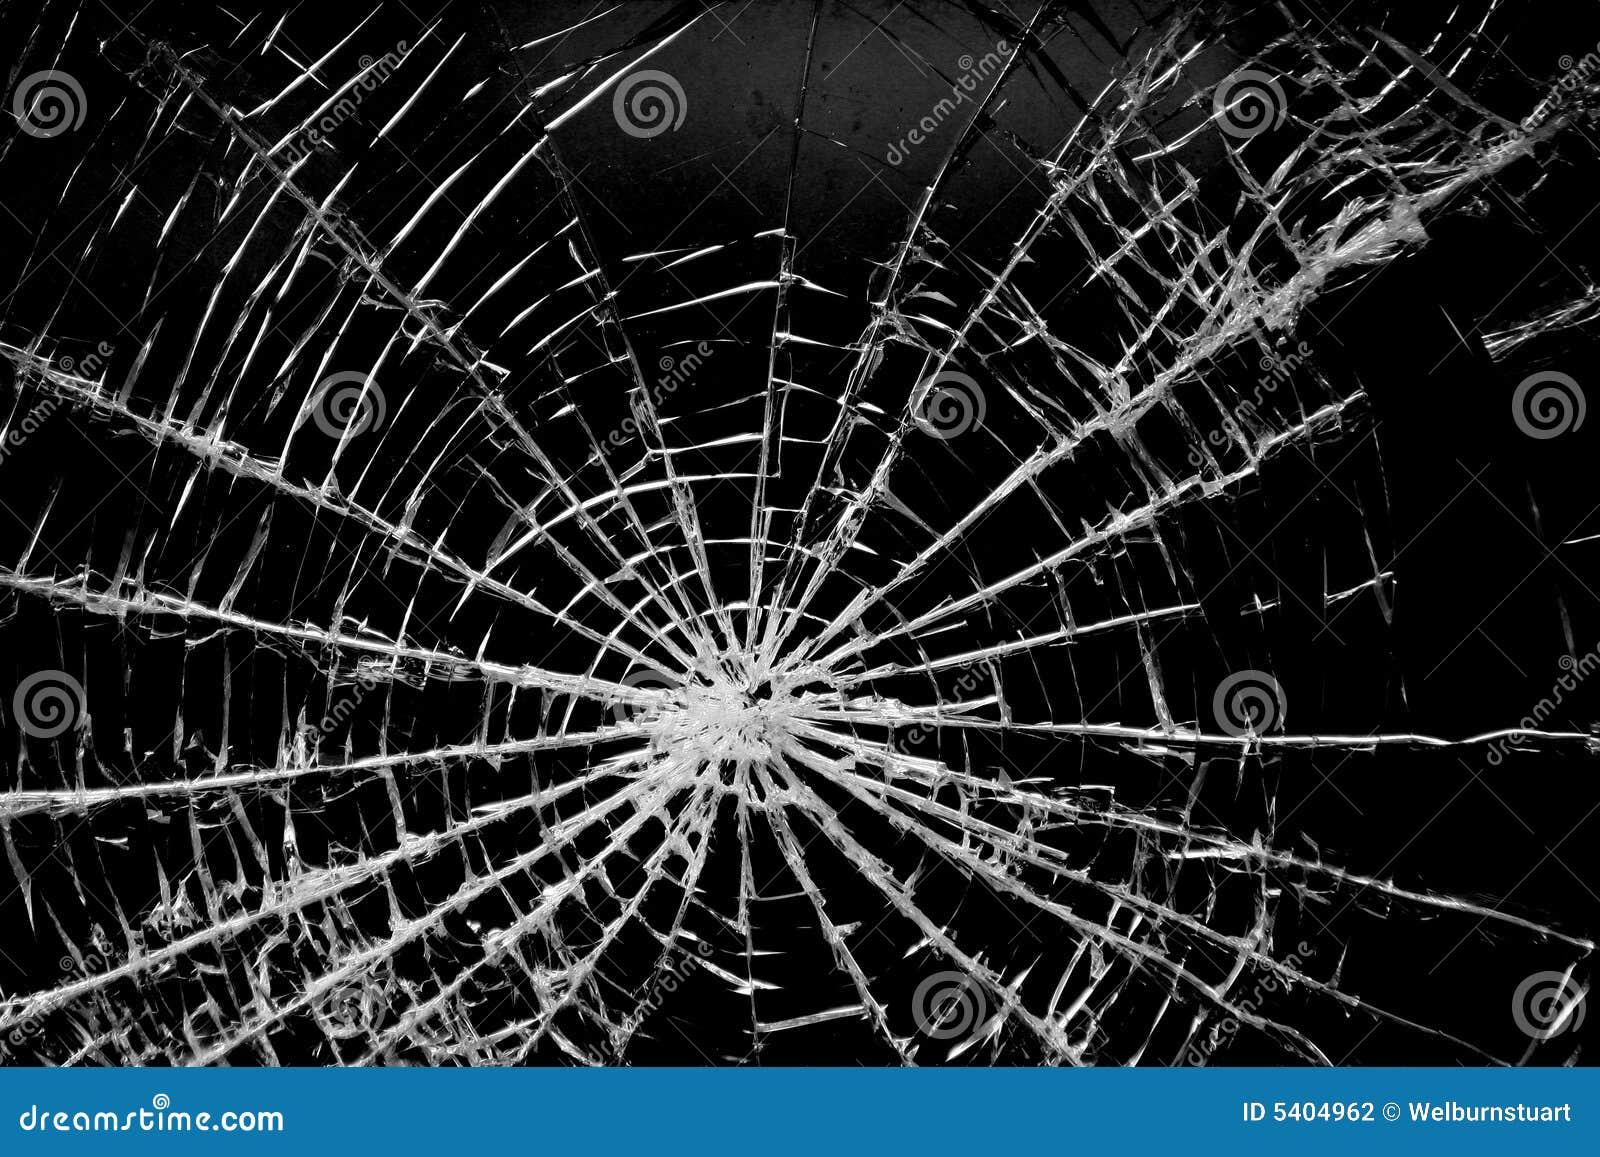 Smashedglass1